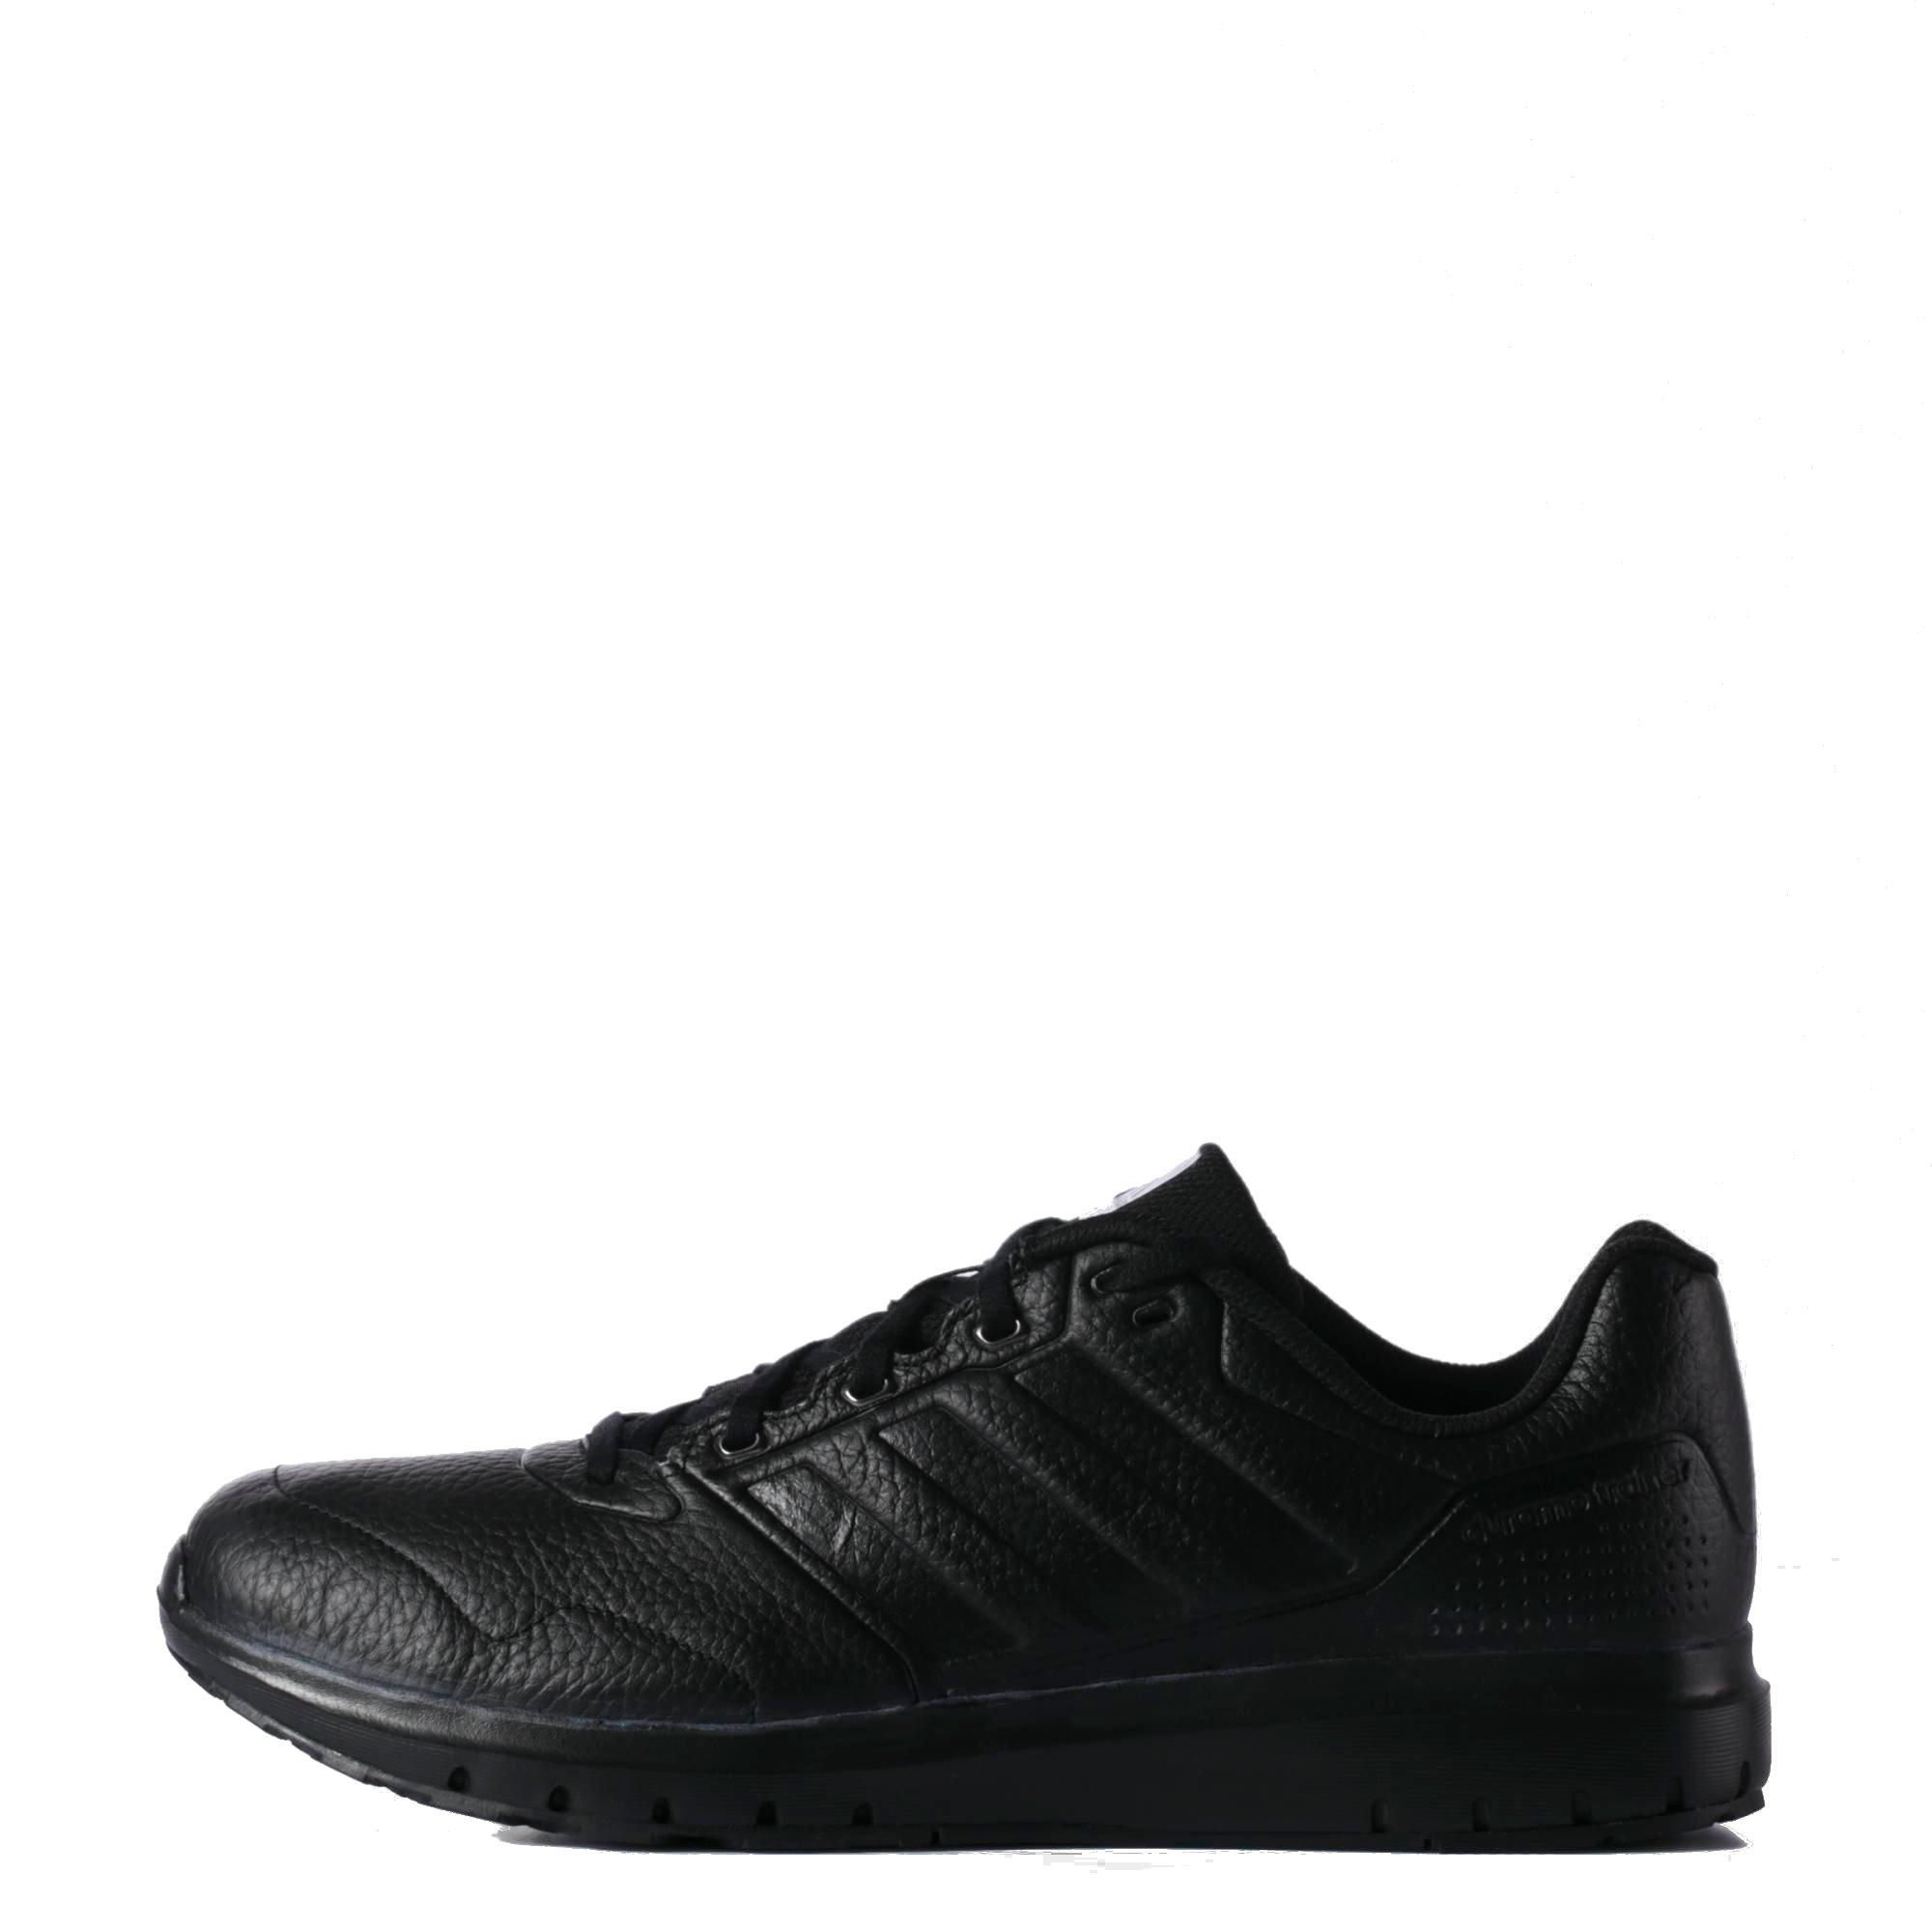 adidas duramo trainer leather